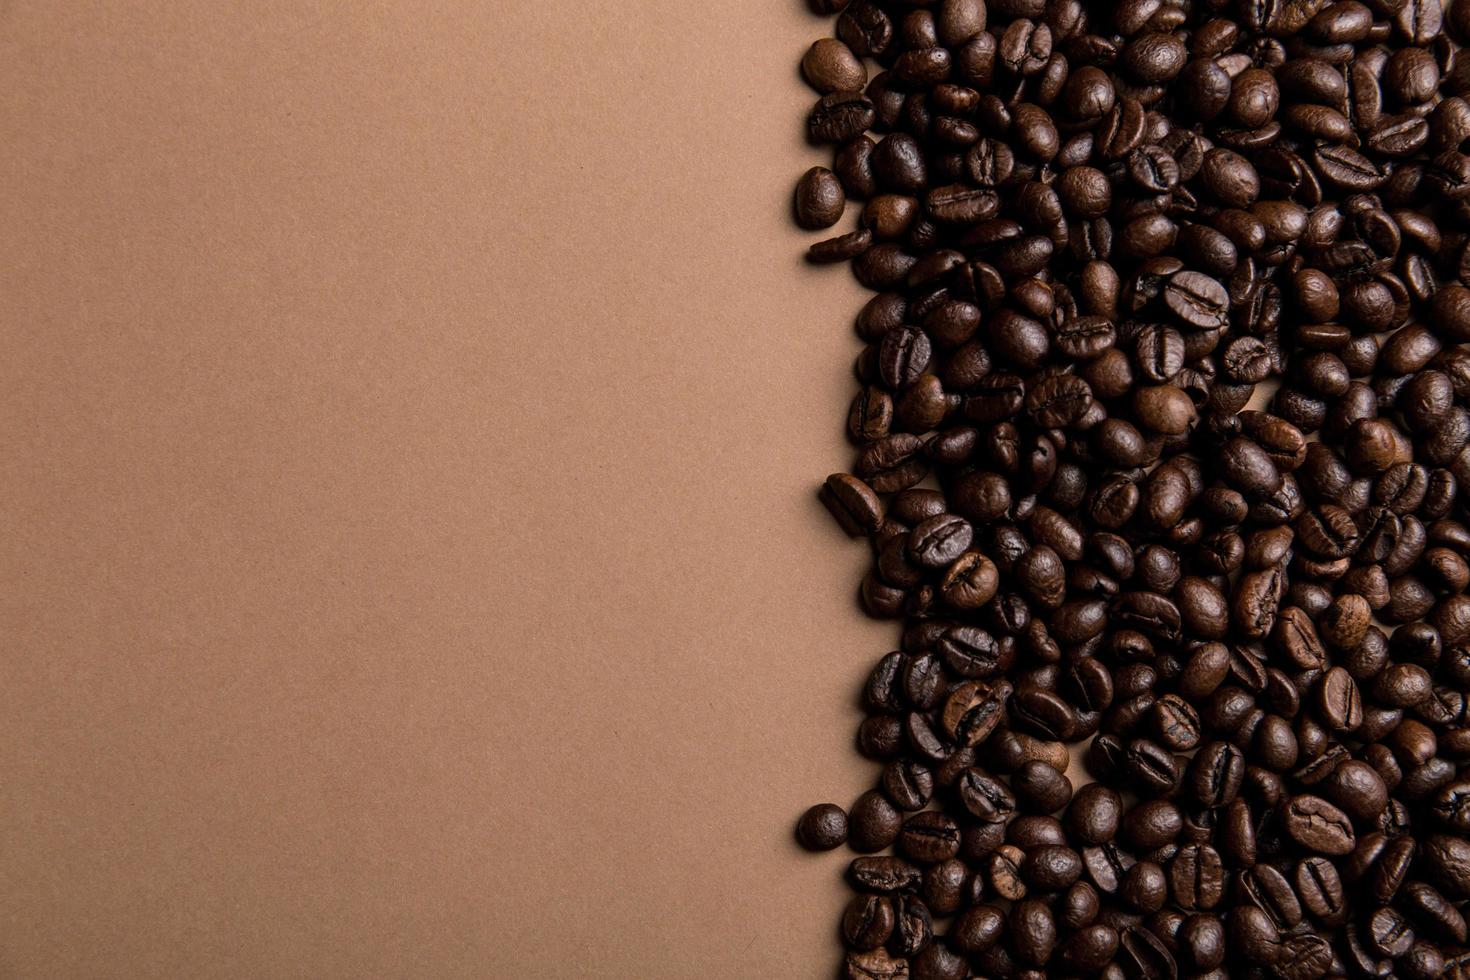 bruna kaffebönor foto